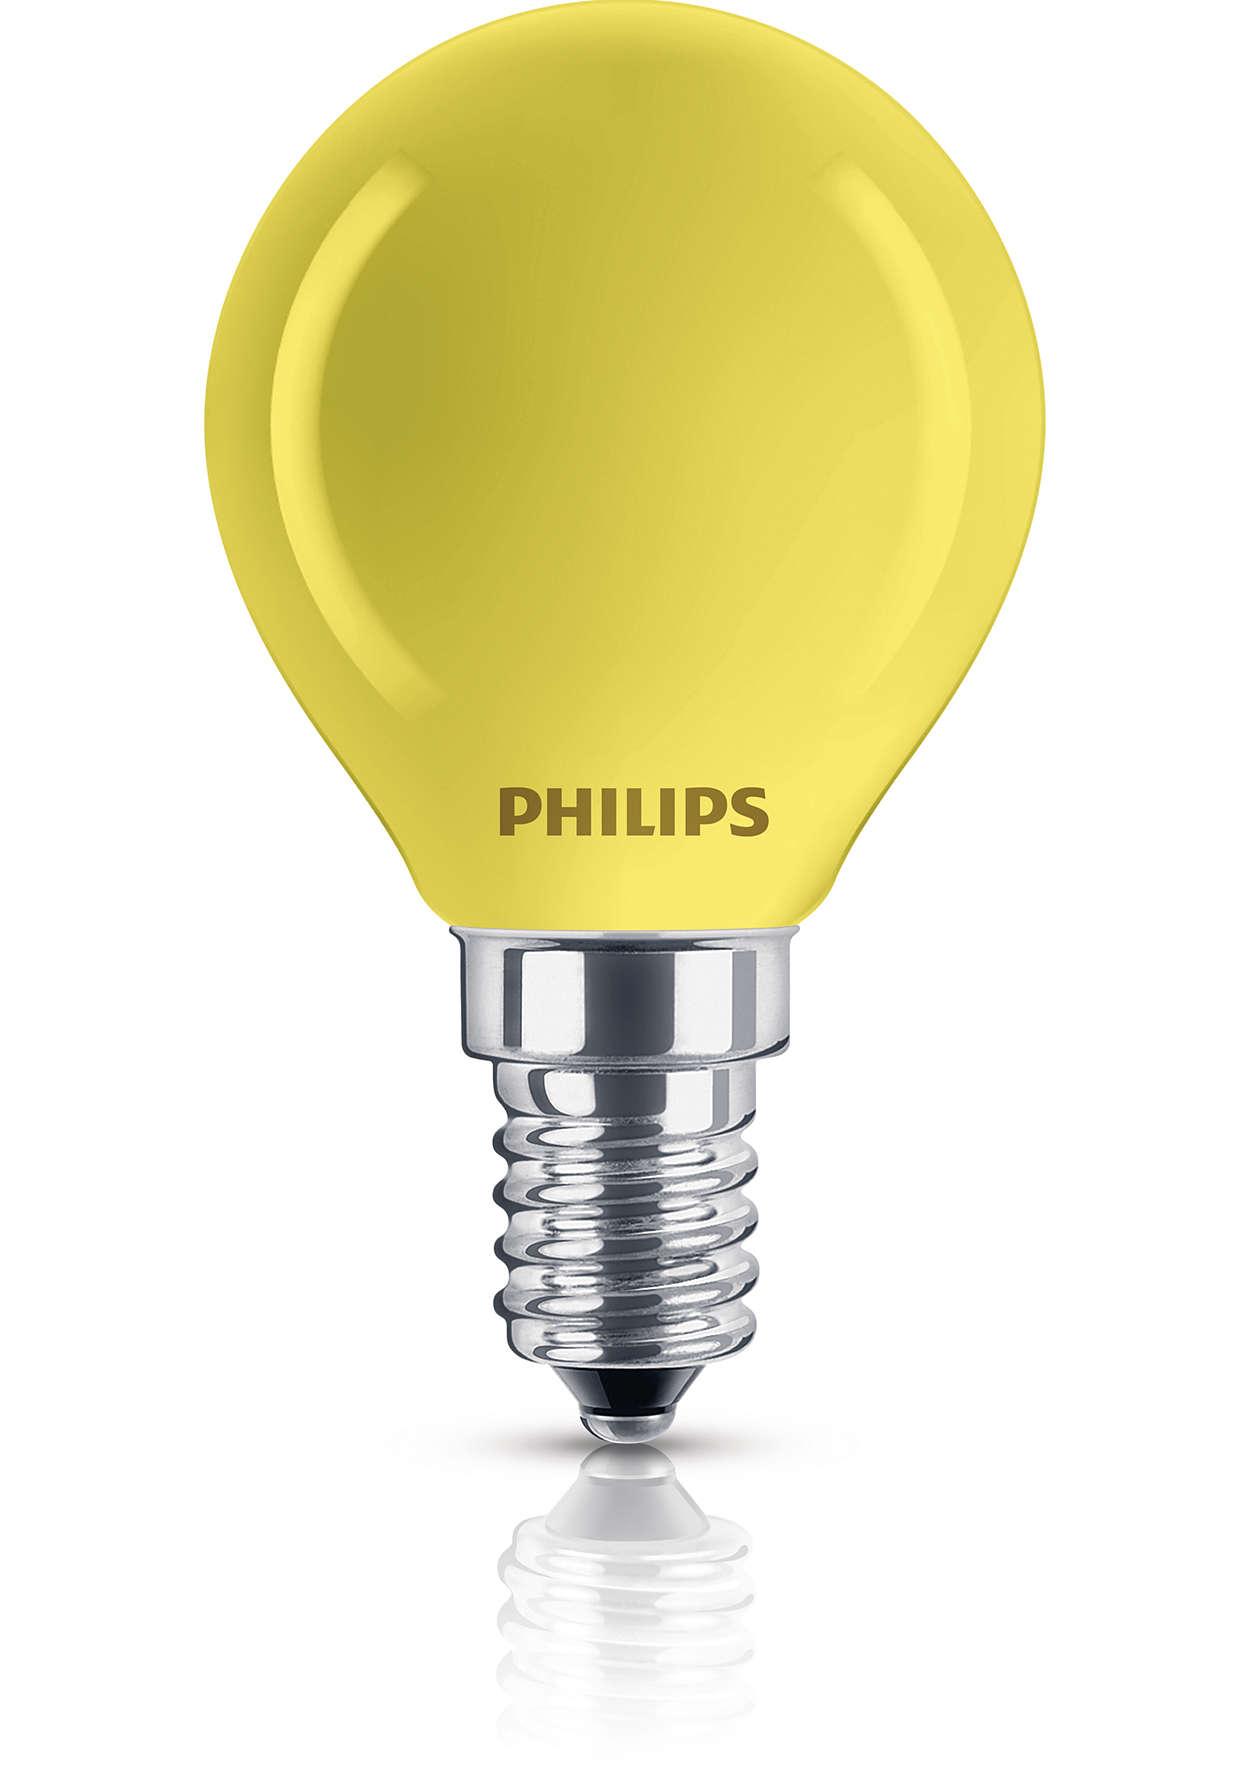 Belagd reflektorlampa i olika färger